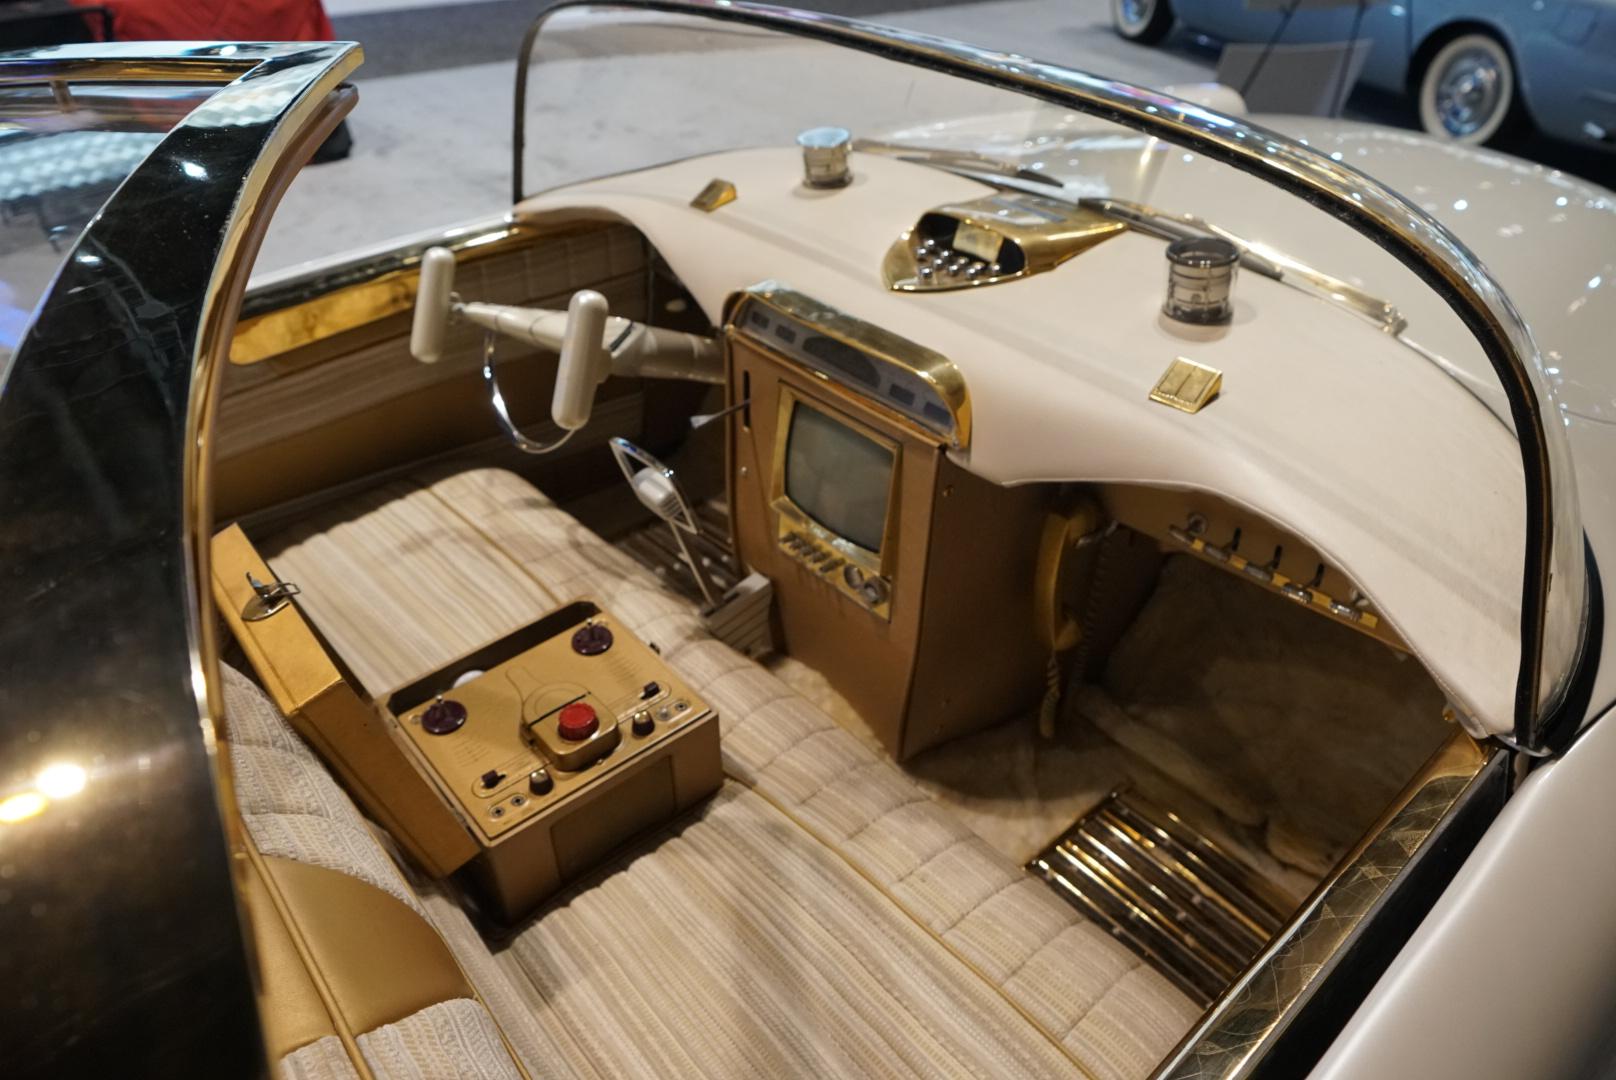 The Golden Sahara II interior